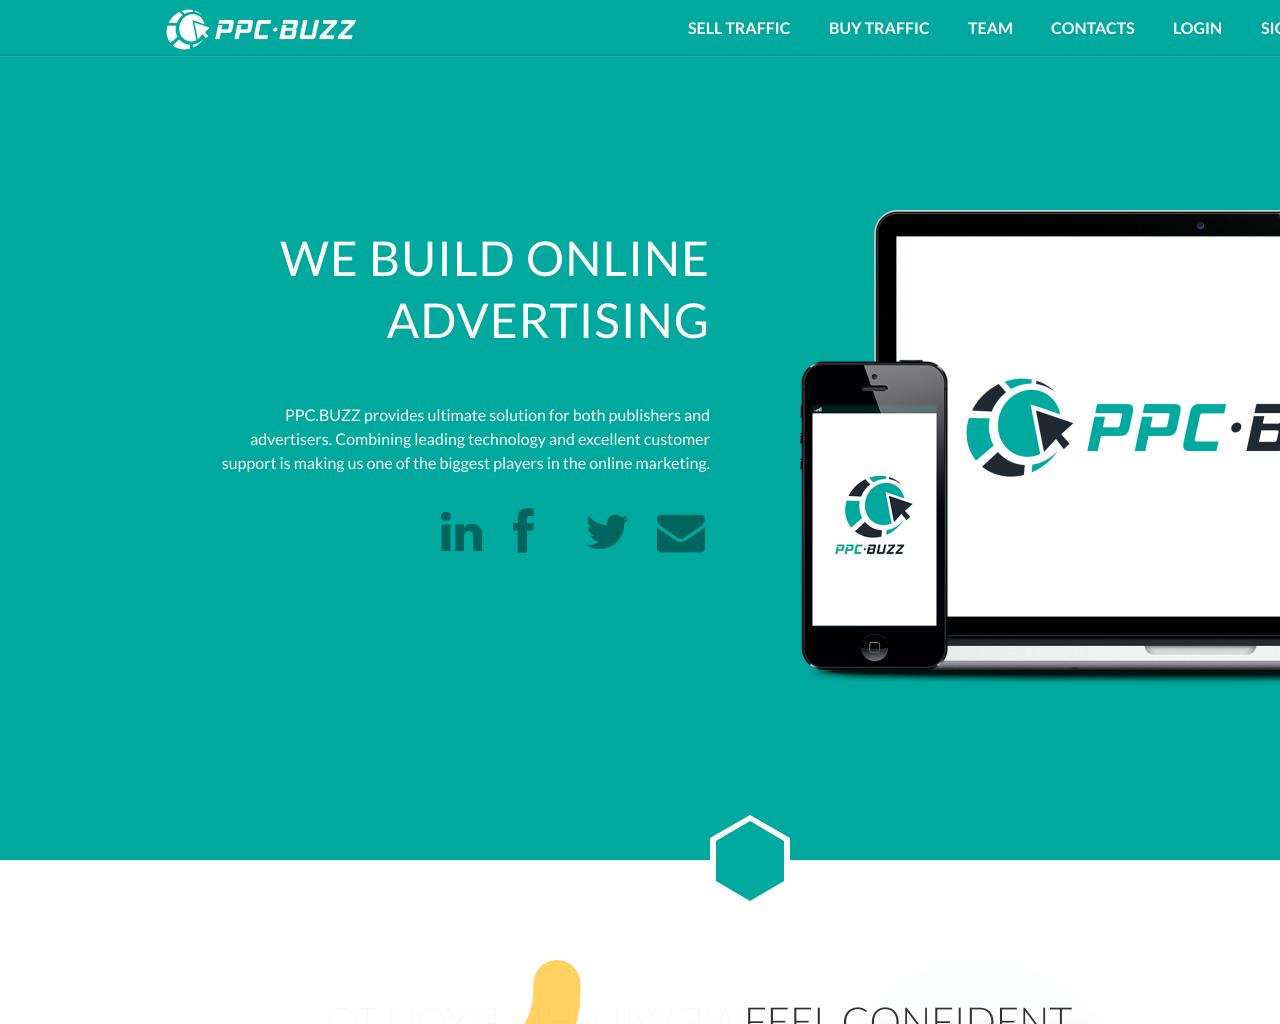 PPC.BUZZ-Advertising-Reviews-Pricing